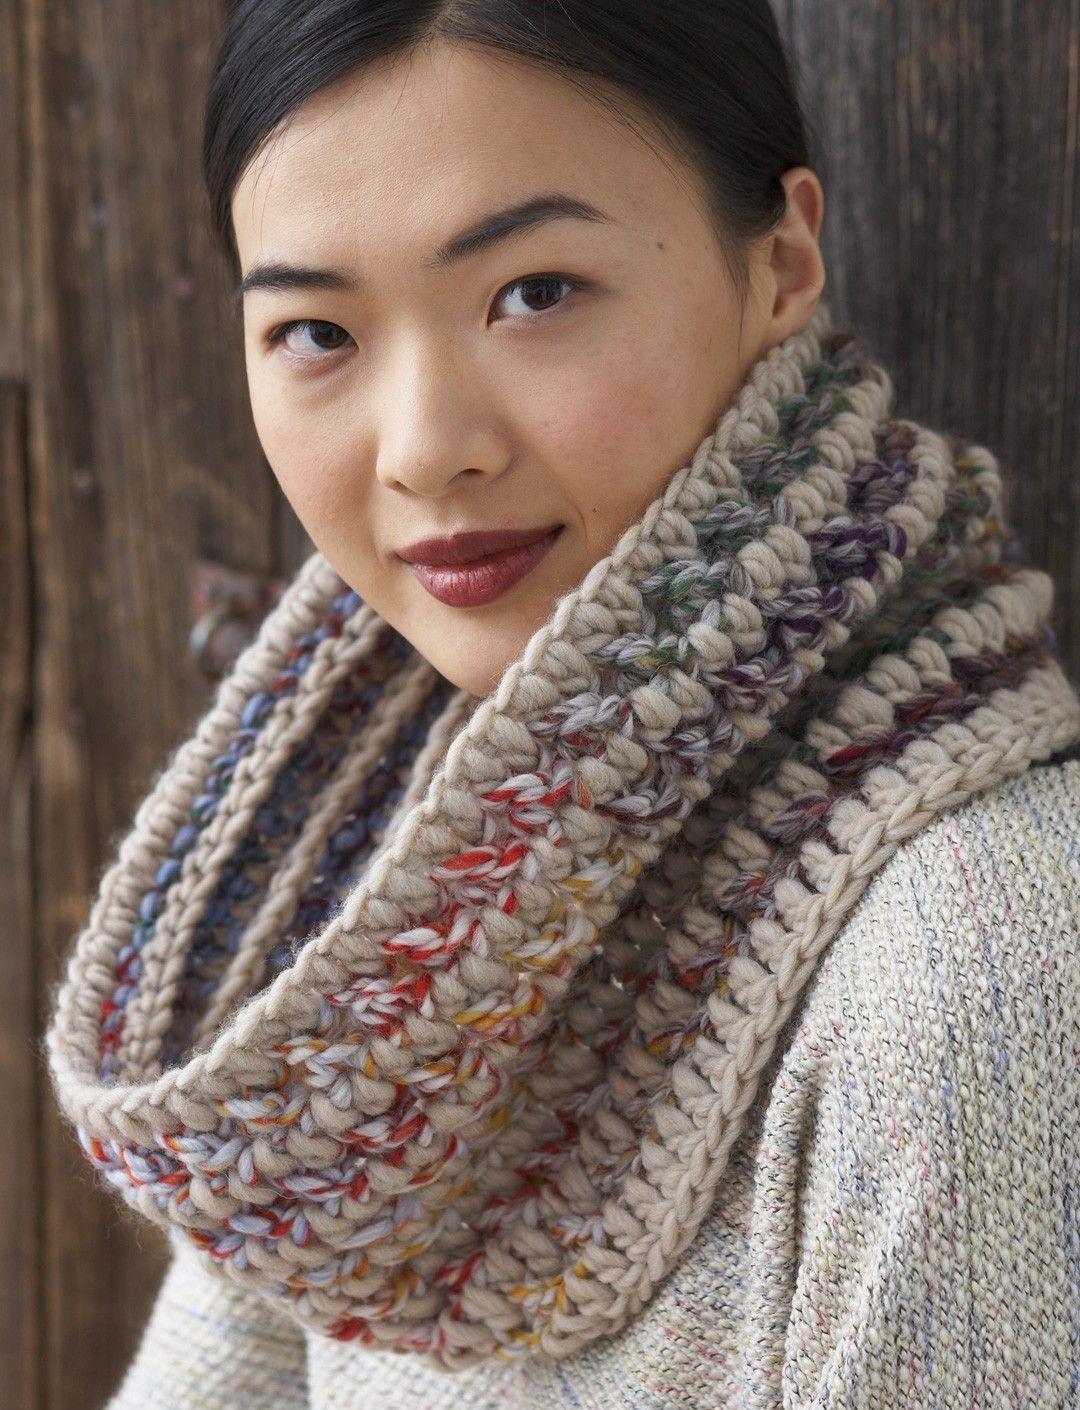 Big Stitch Hat & Cowl - free crochet pattern by Pattons | Crochet y ...